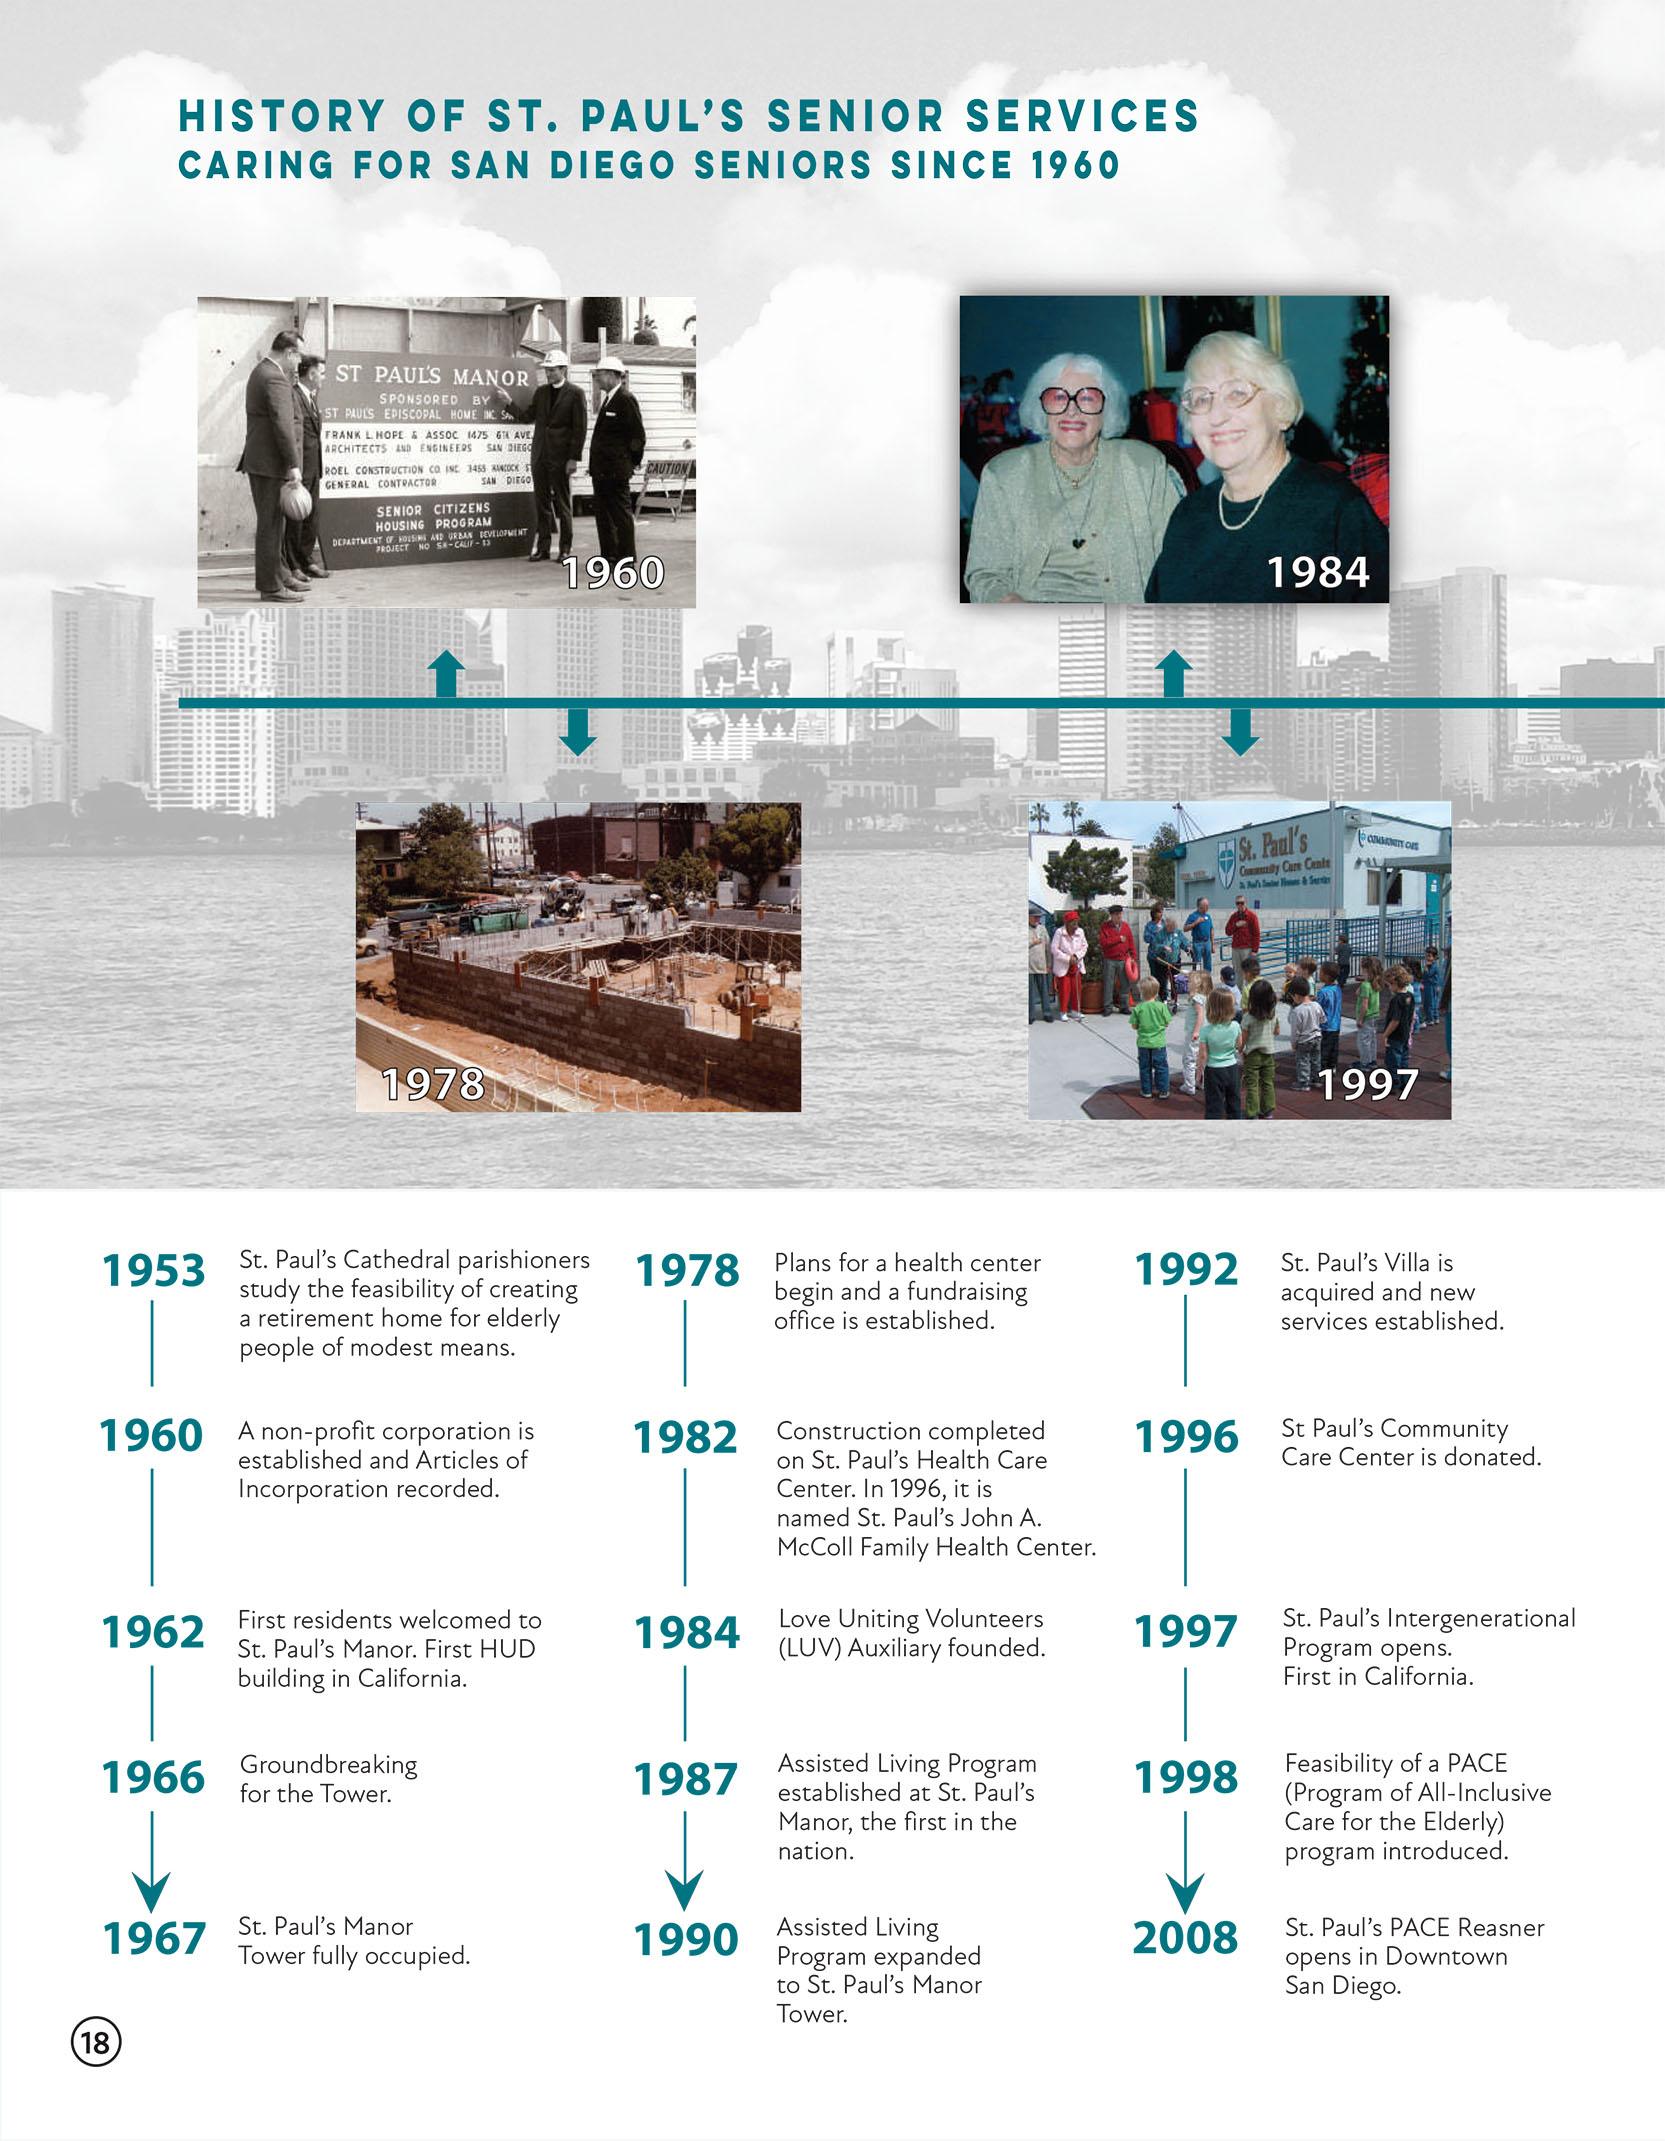 St. Paul's Senior Services Timeline